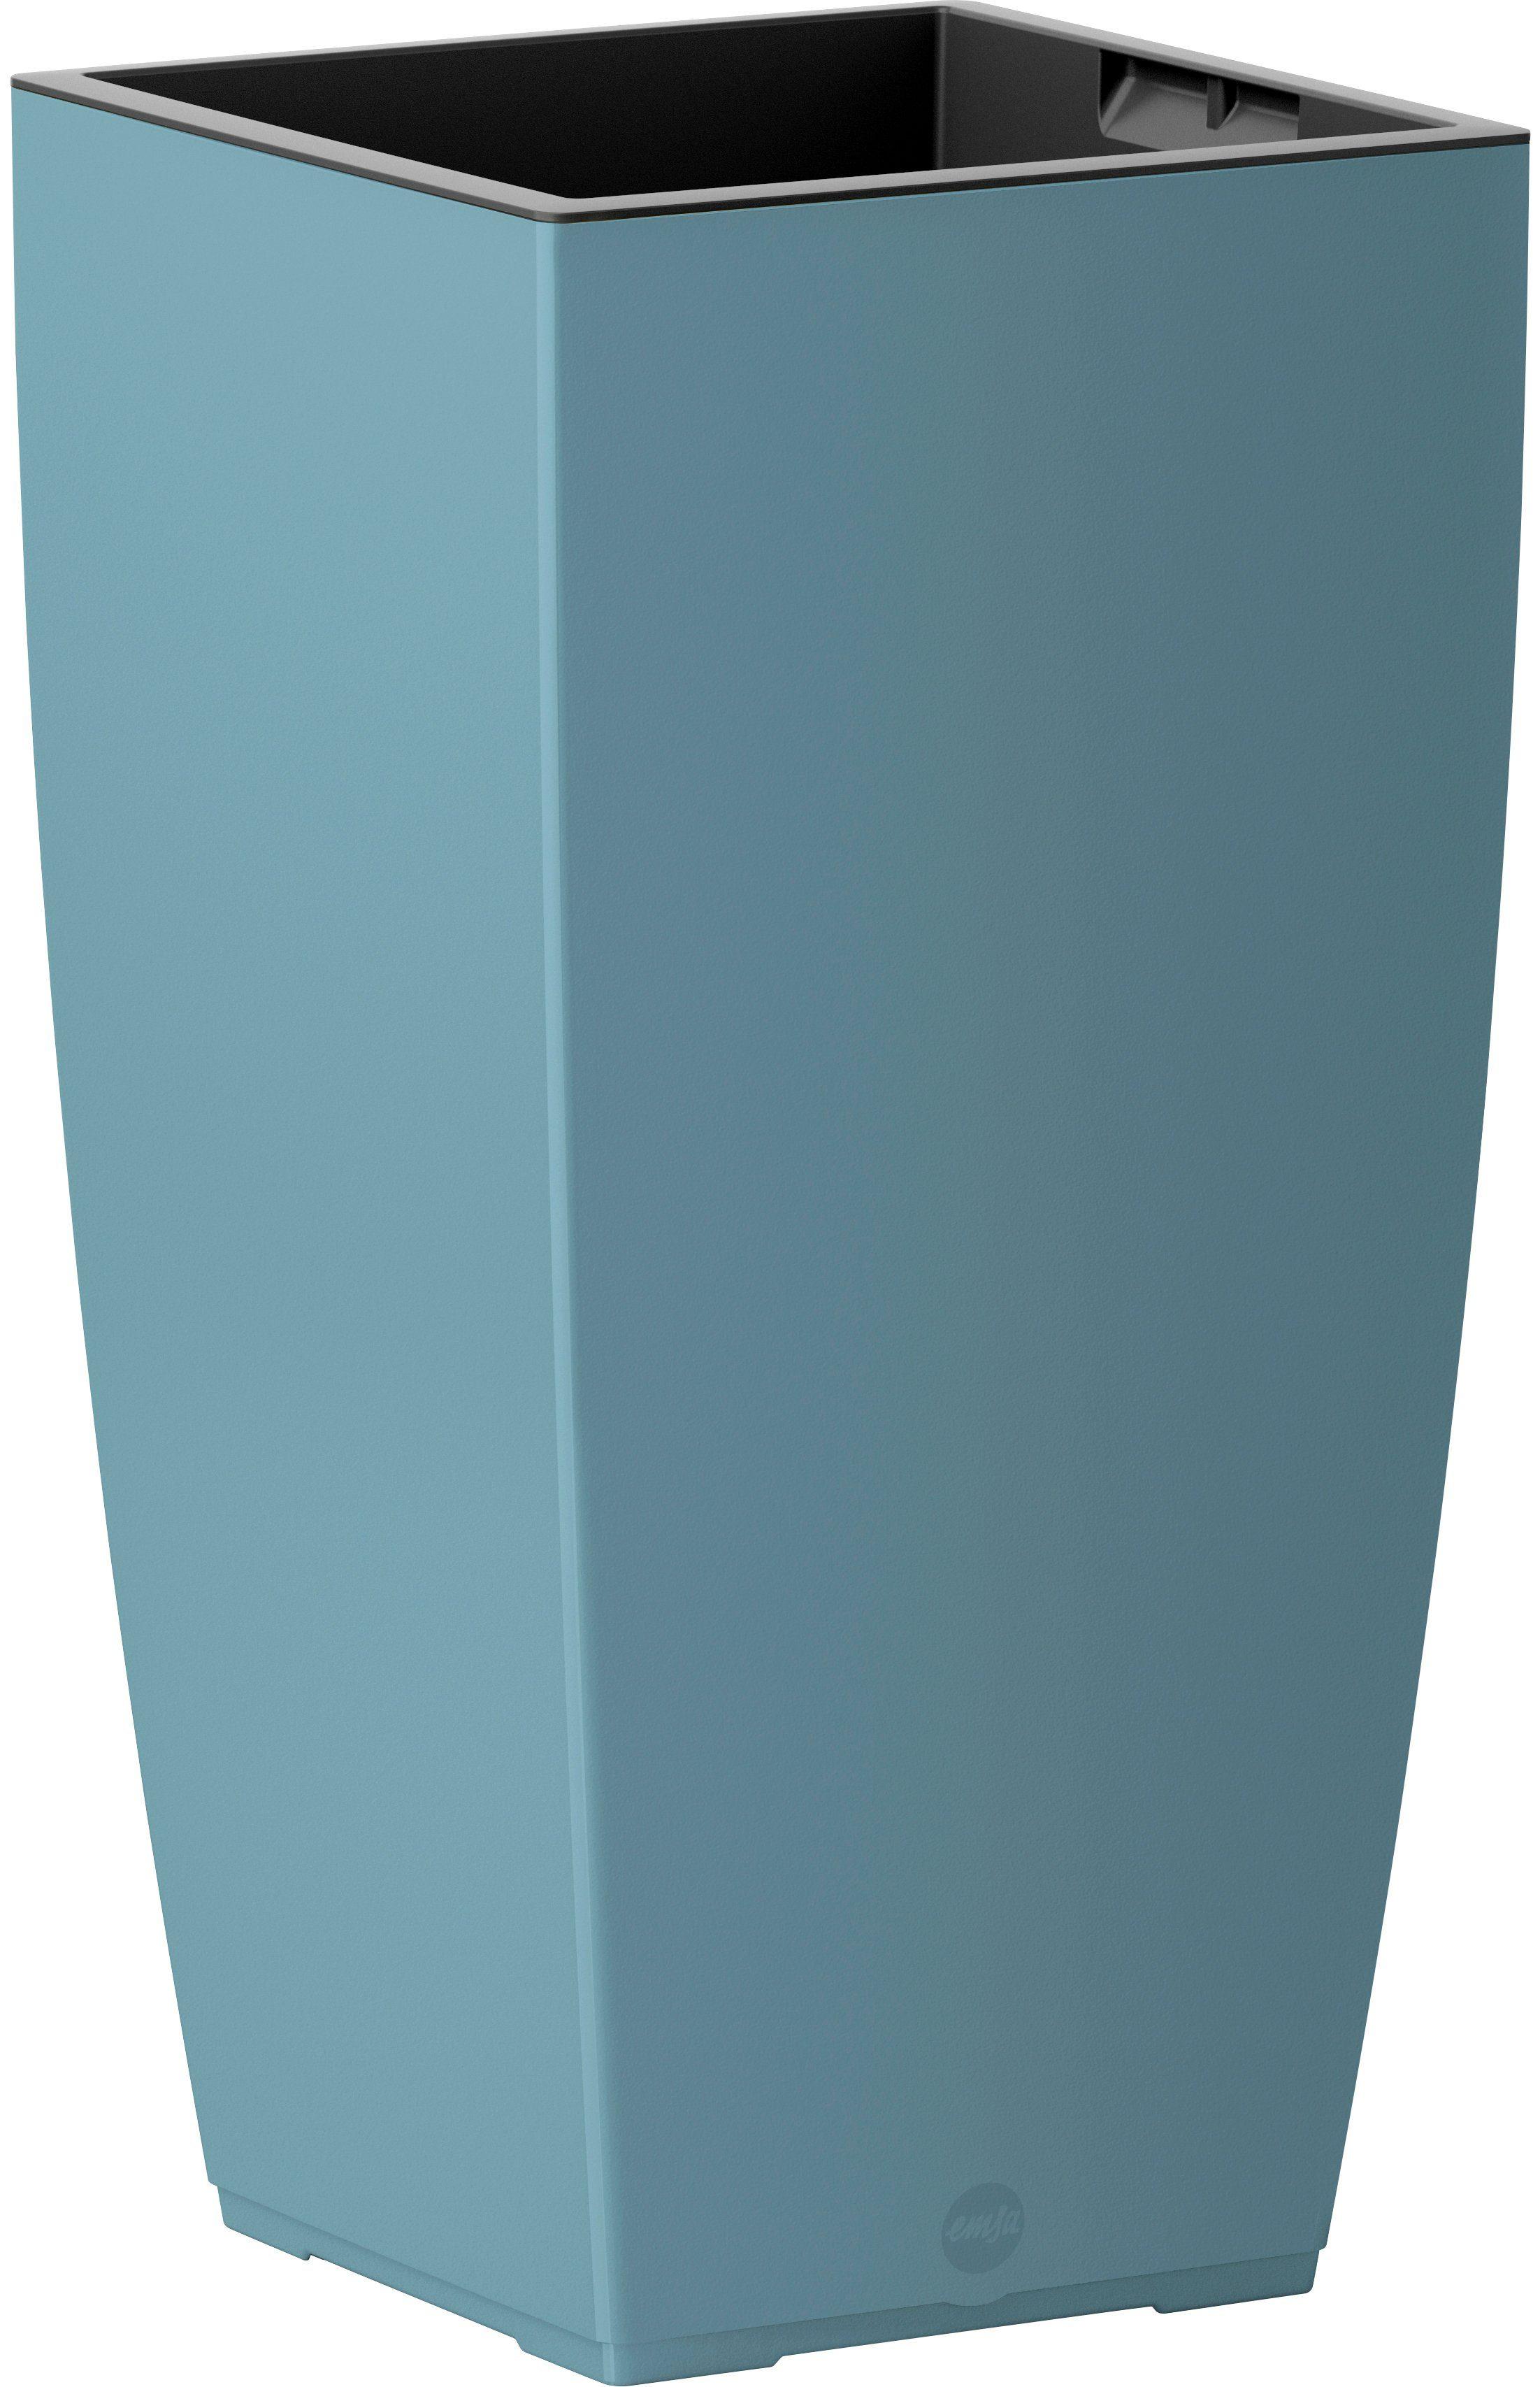 Emsa Blumenkasten »CASA Matt Säule«, BxTxH: 30x30x57 cm, altblau